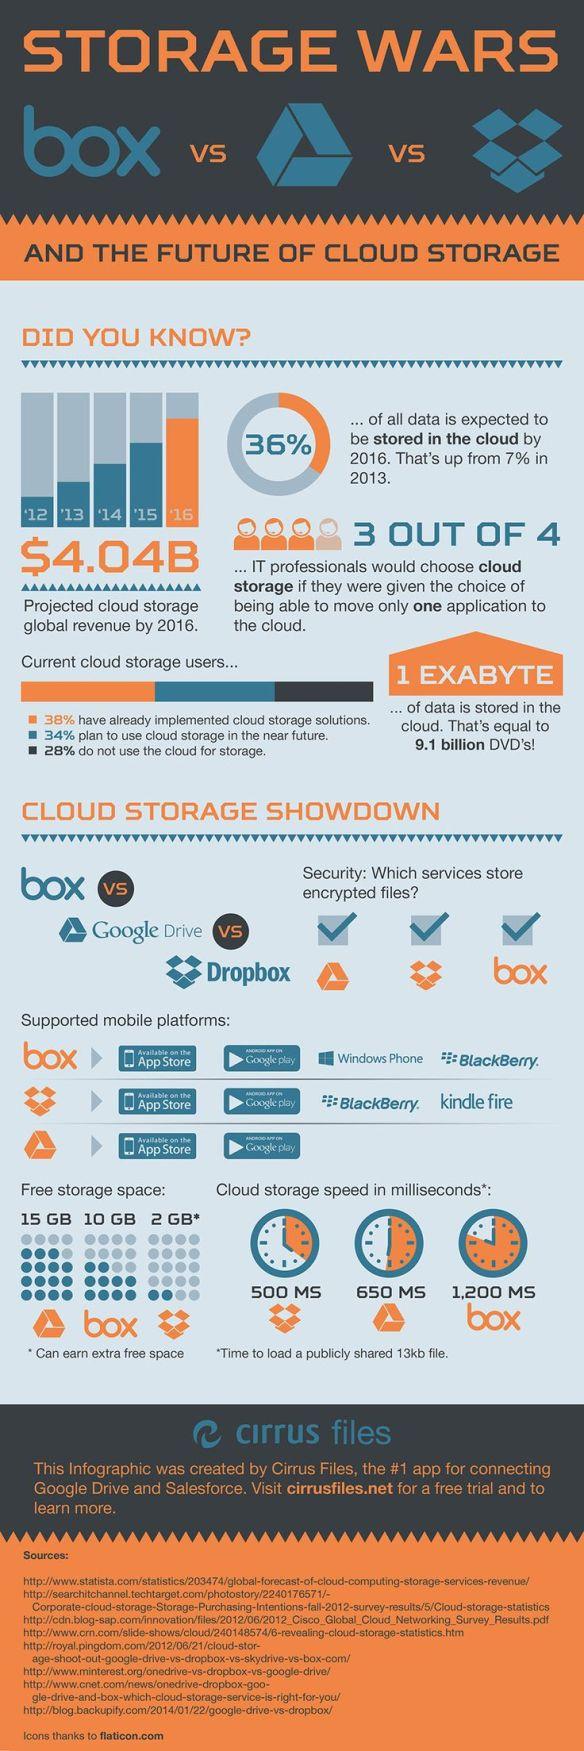 storagewars